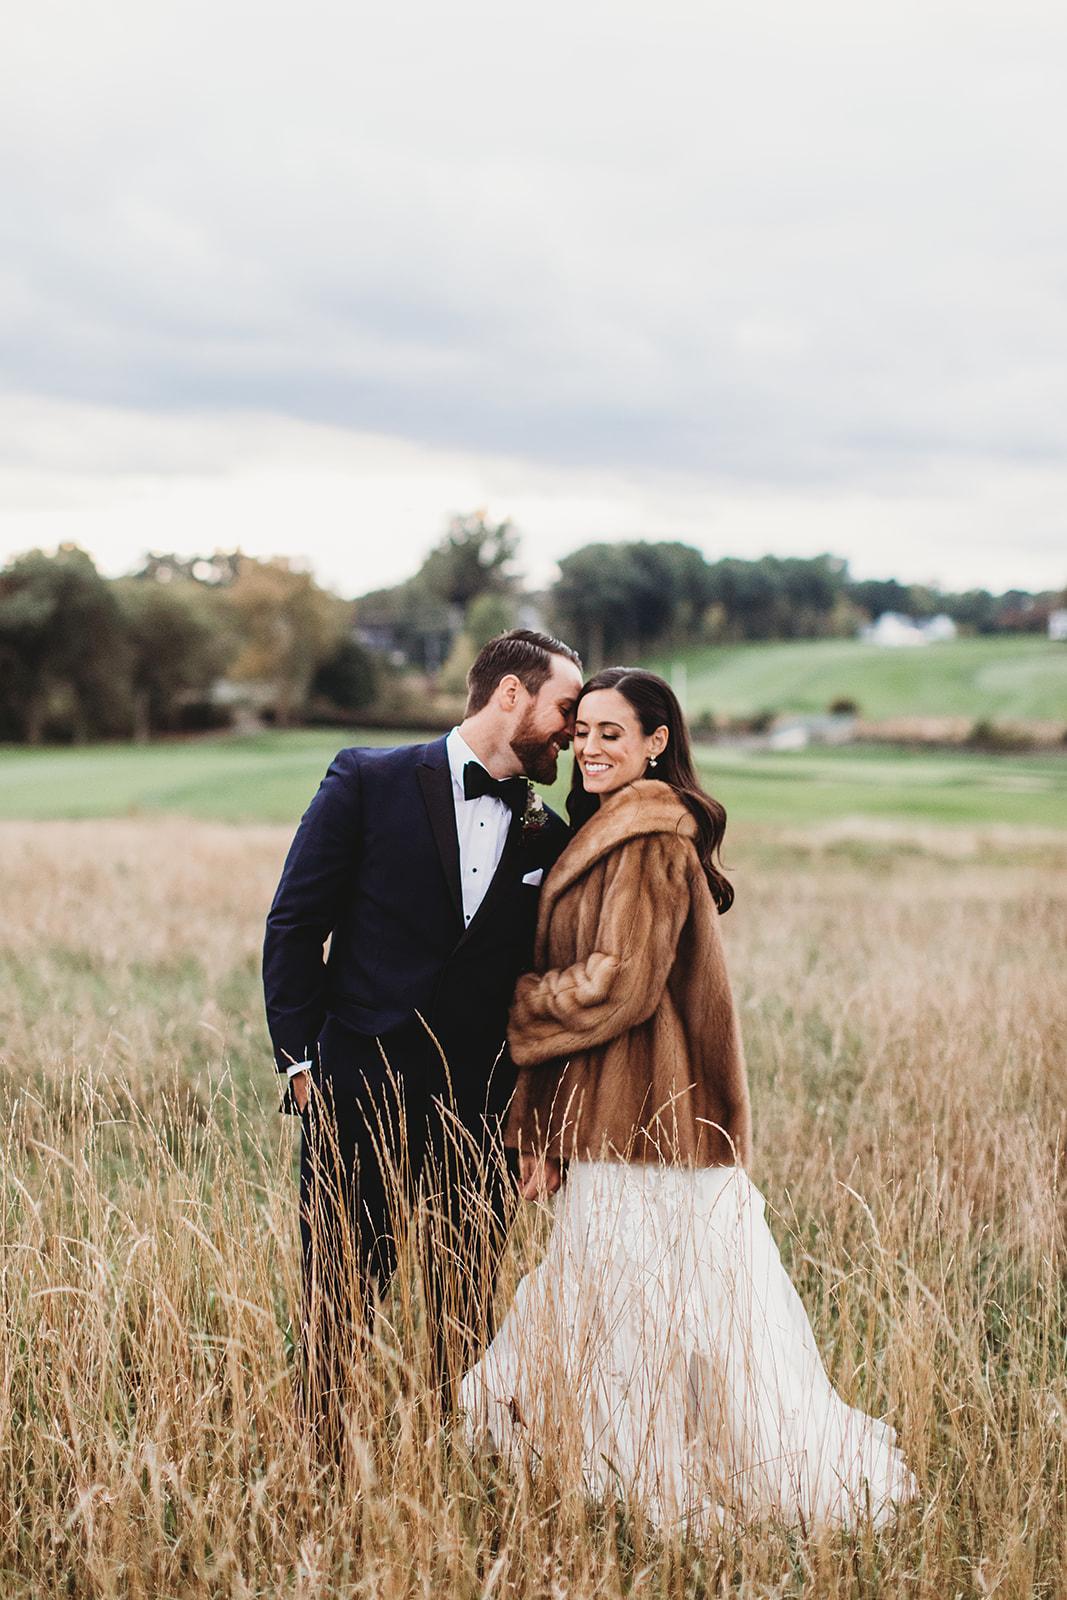 Ryan-Zarichnak-Photography-Pittsburgh-Susan-Evan-Wedding-2274.jpg